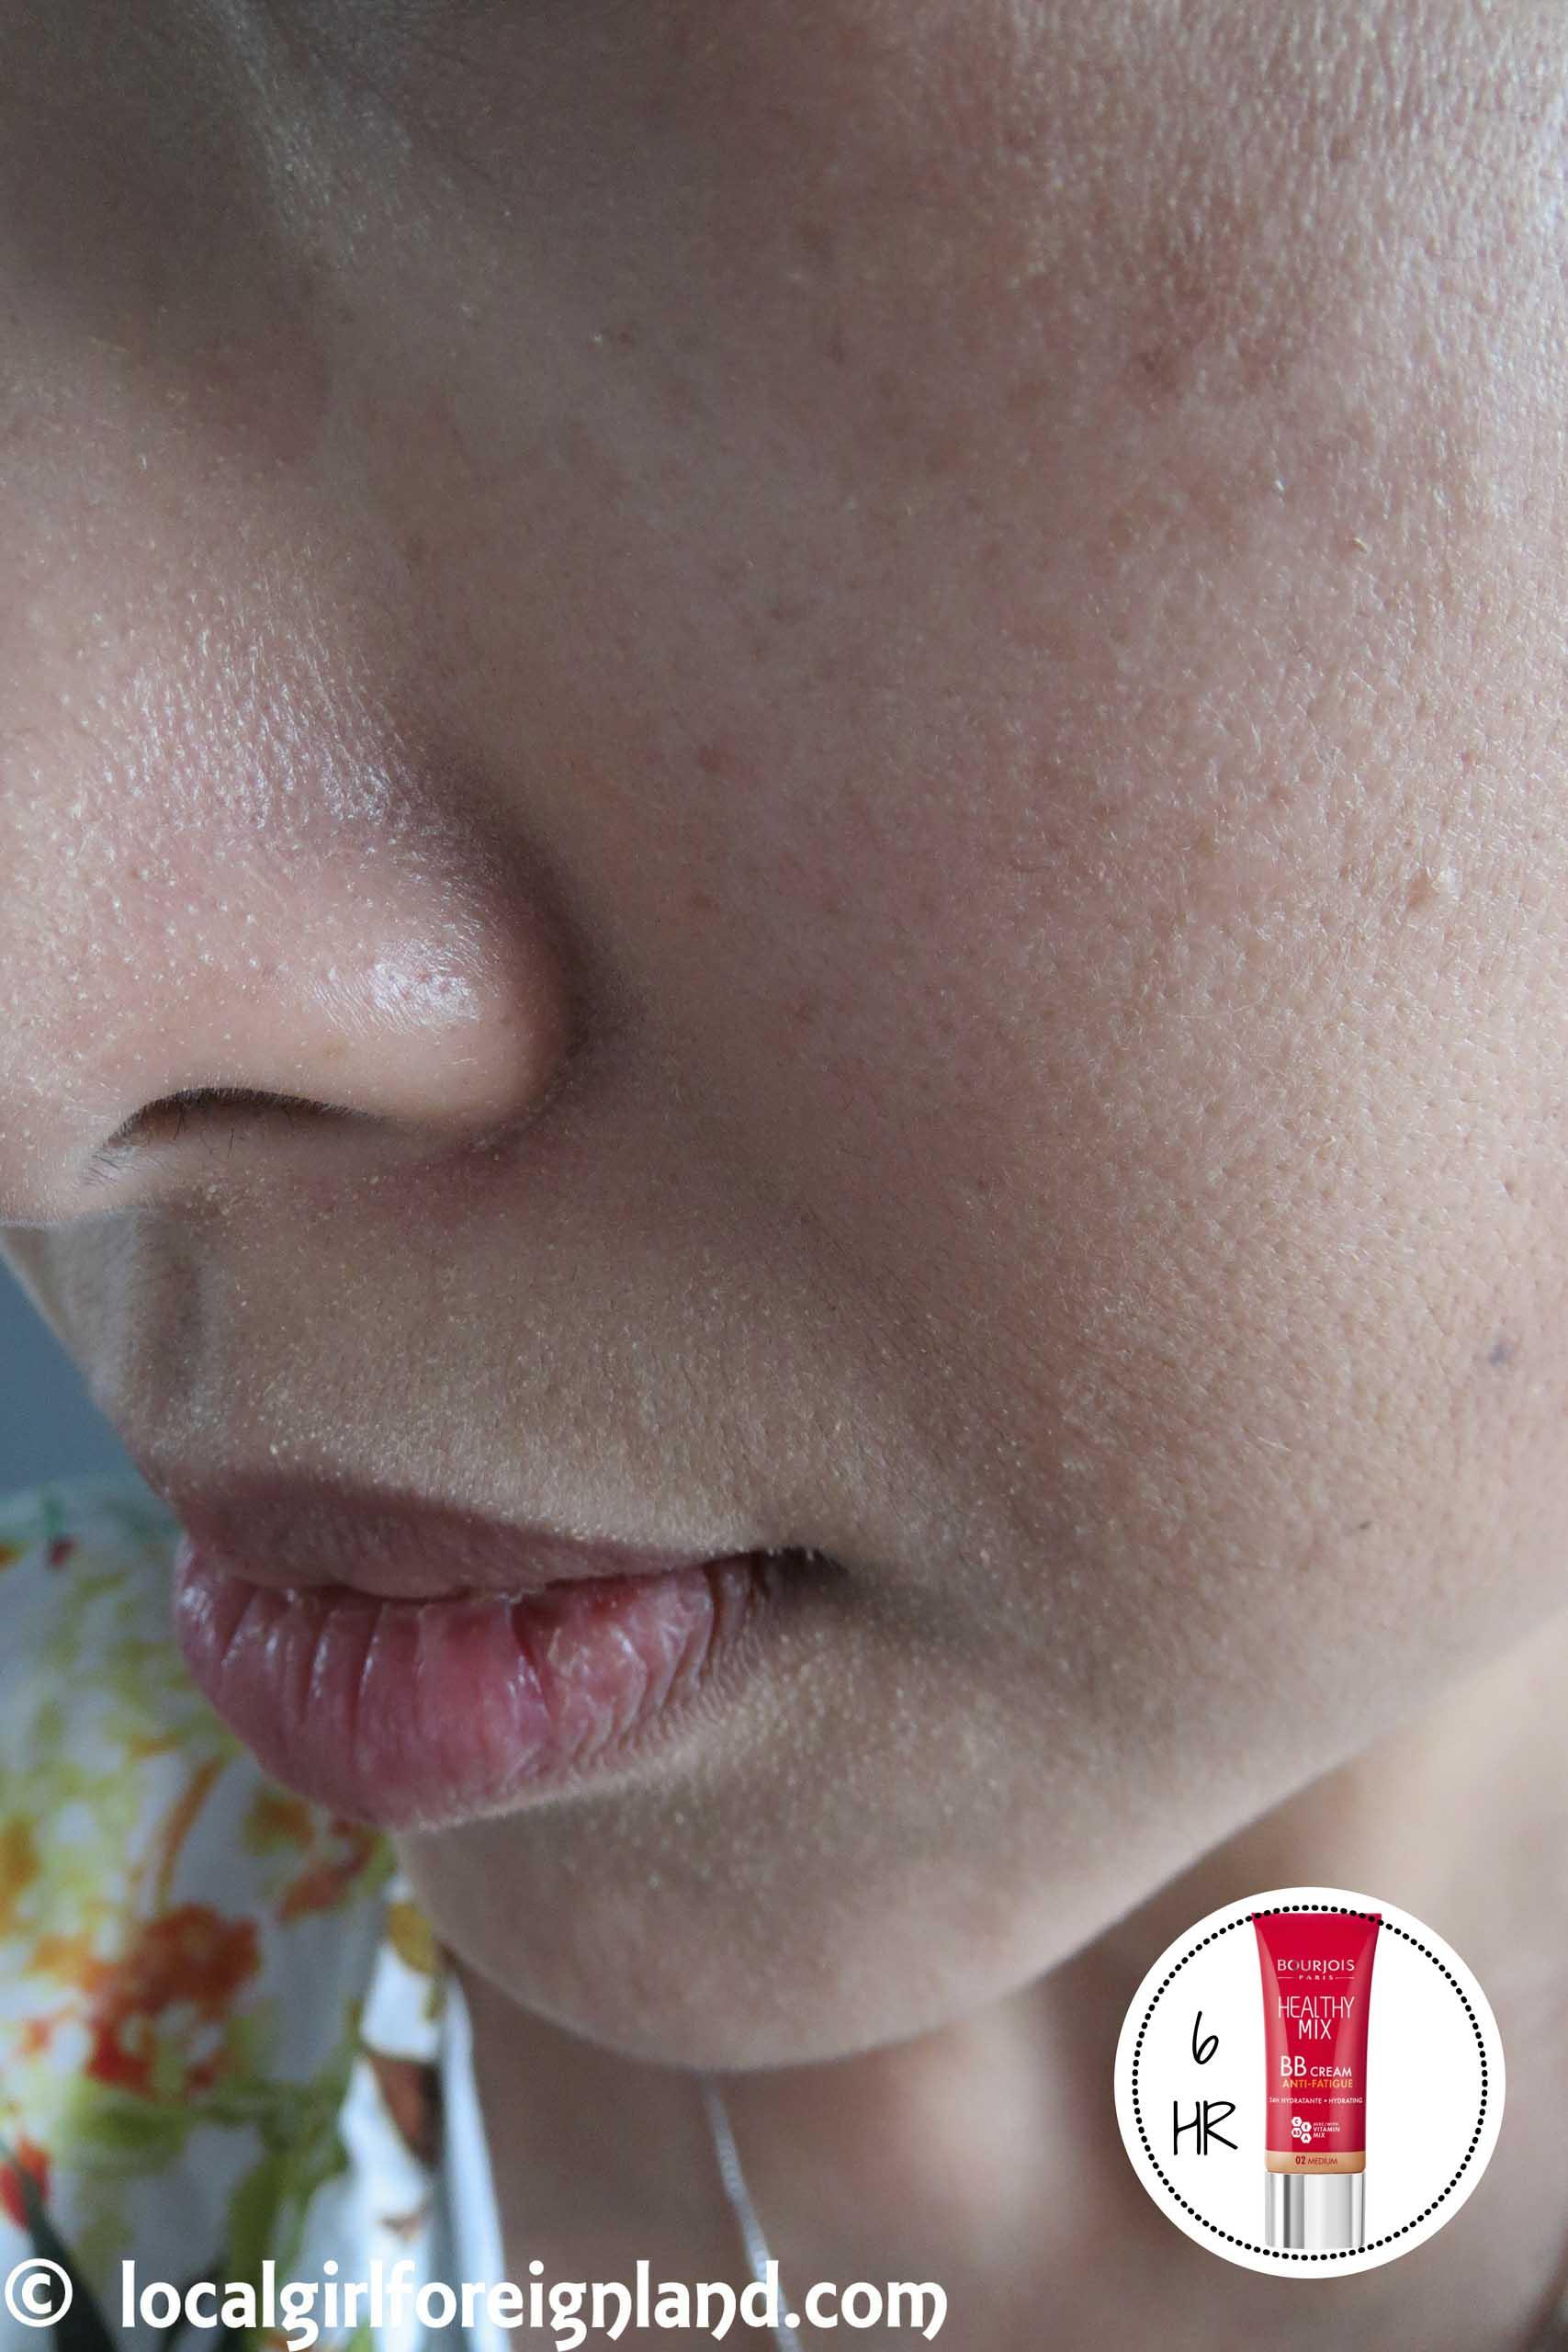 bourjois-healthy-mix-bb-cream-review-6